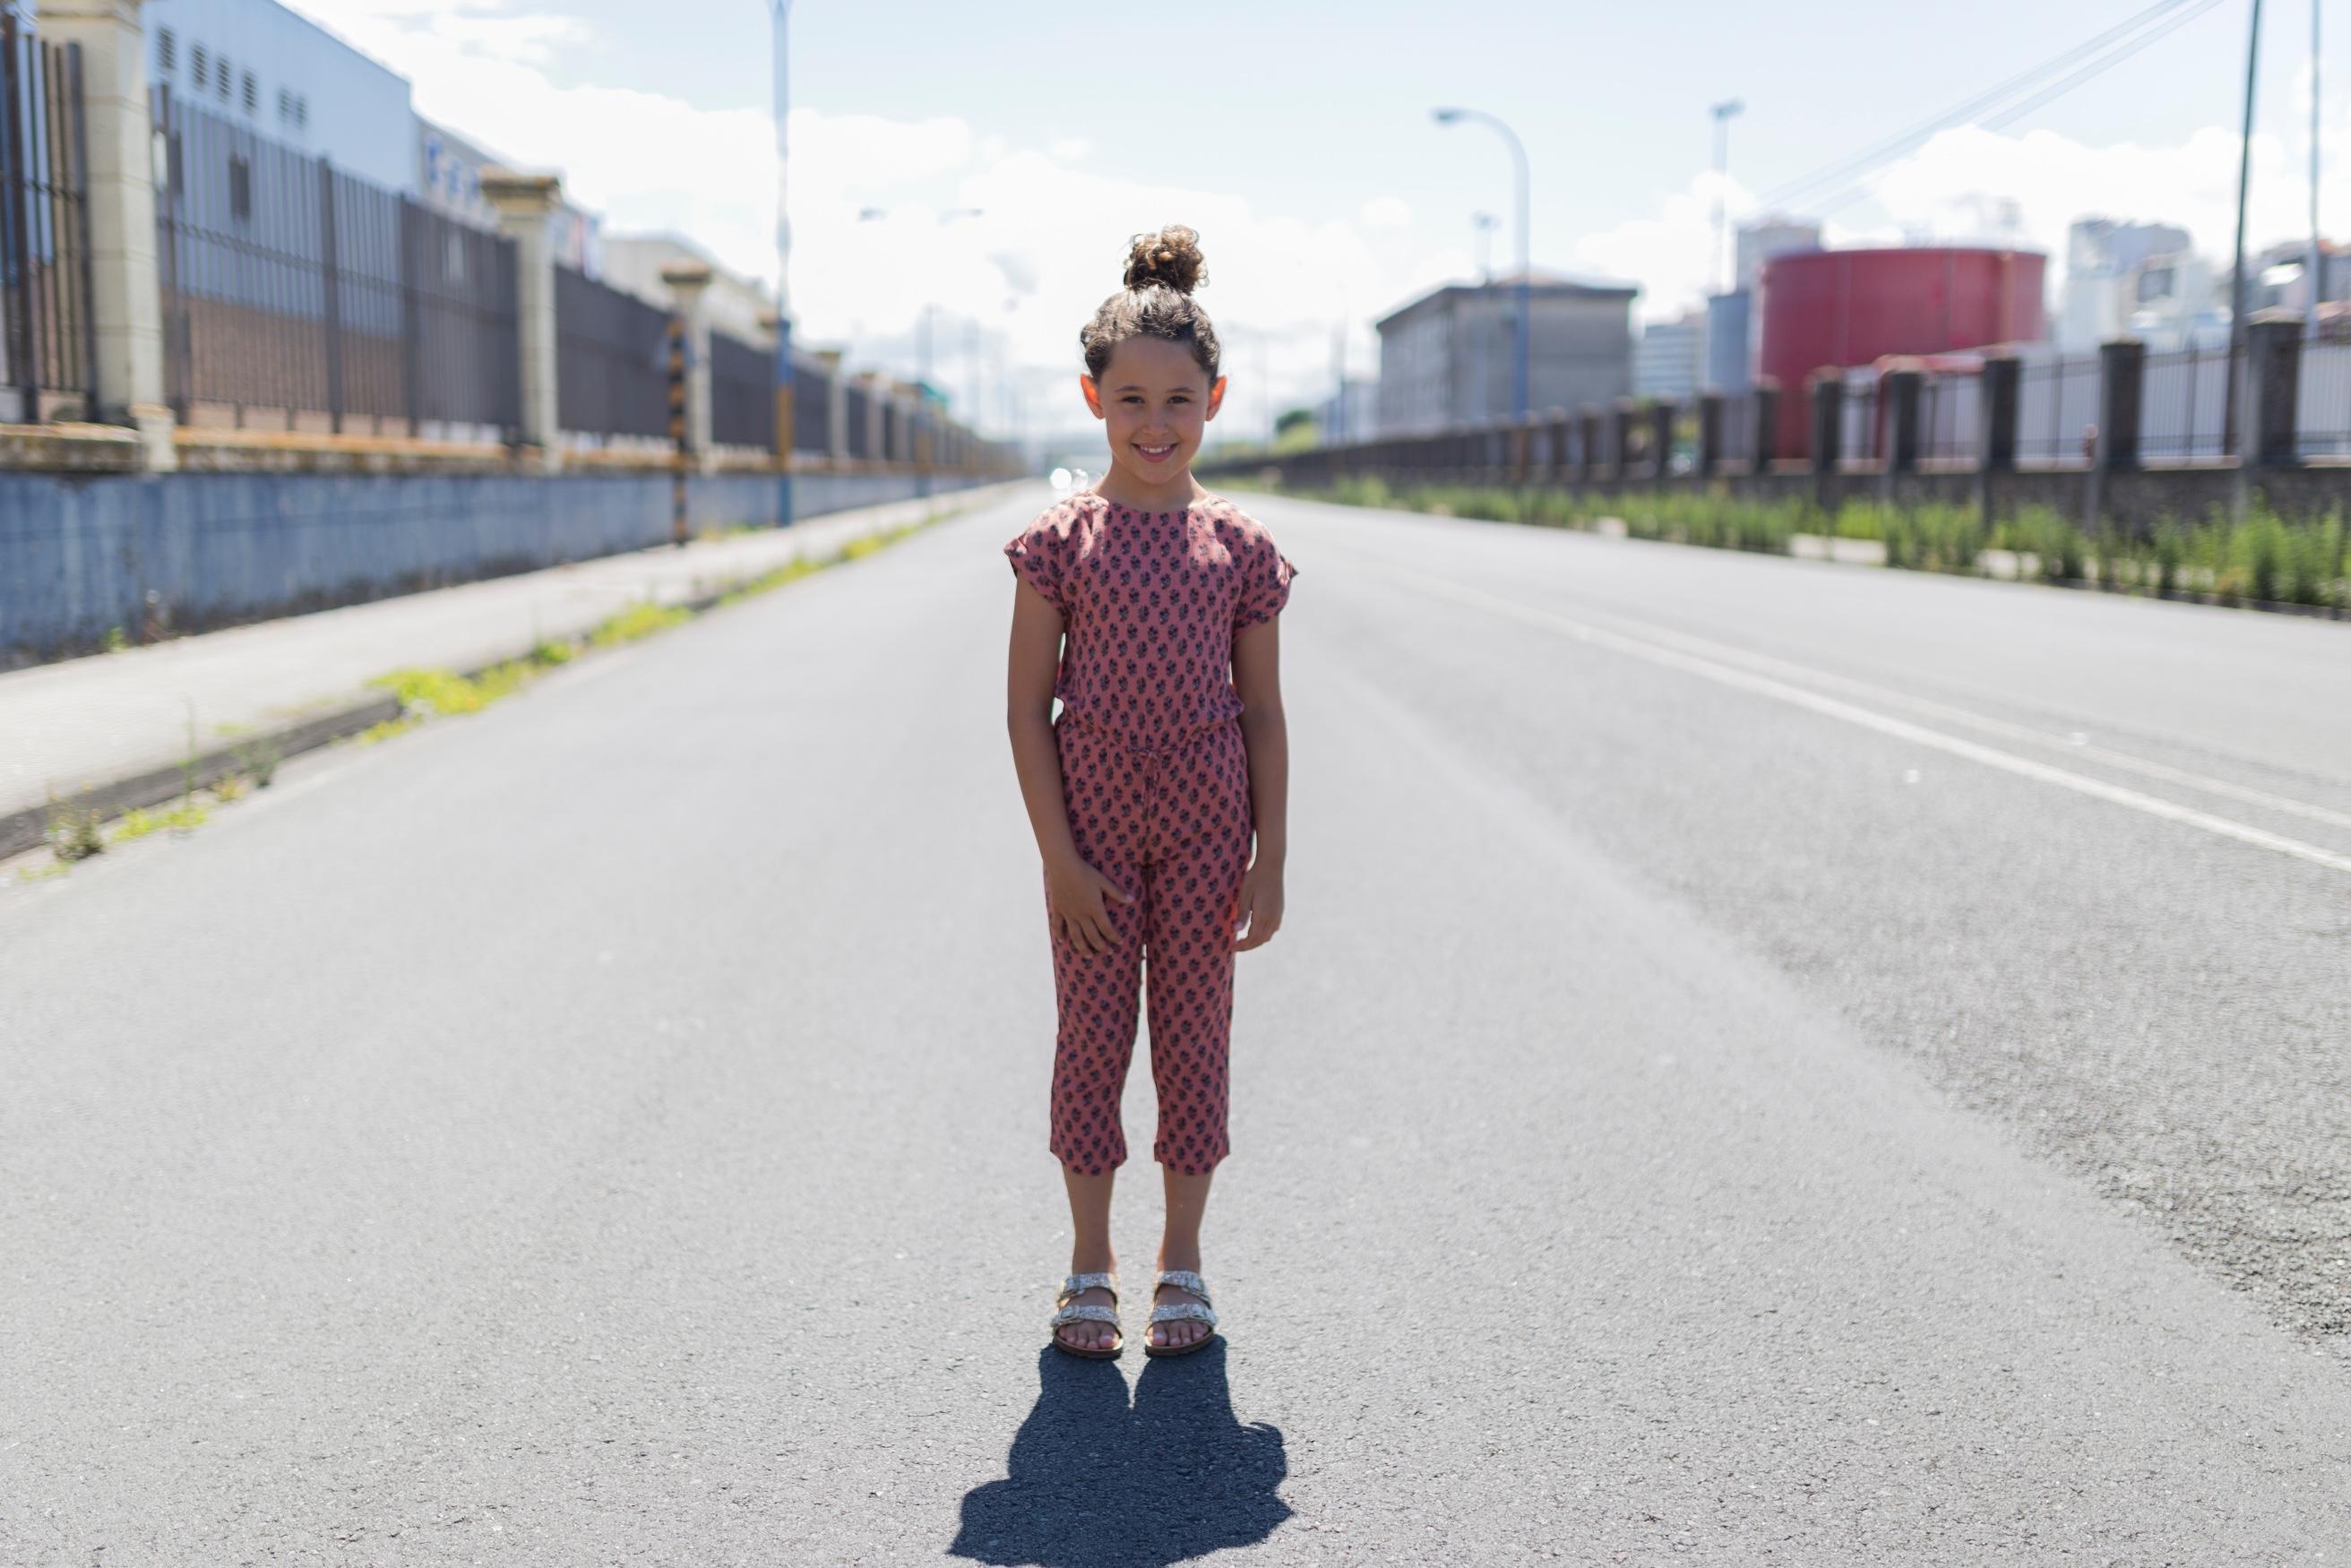 bye bye summer!- stylelovely-moda-niños-coruña- jimena look- kids- miniblogger- ministyle- Soft- streetstyle- zara- zara kids- zara soft-descalzaporelparque-fashion kids